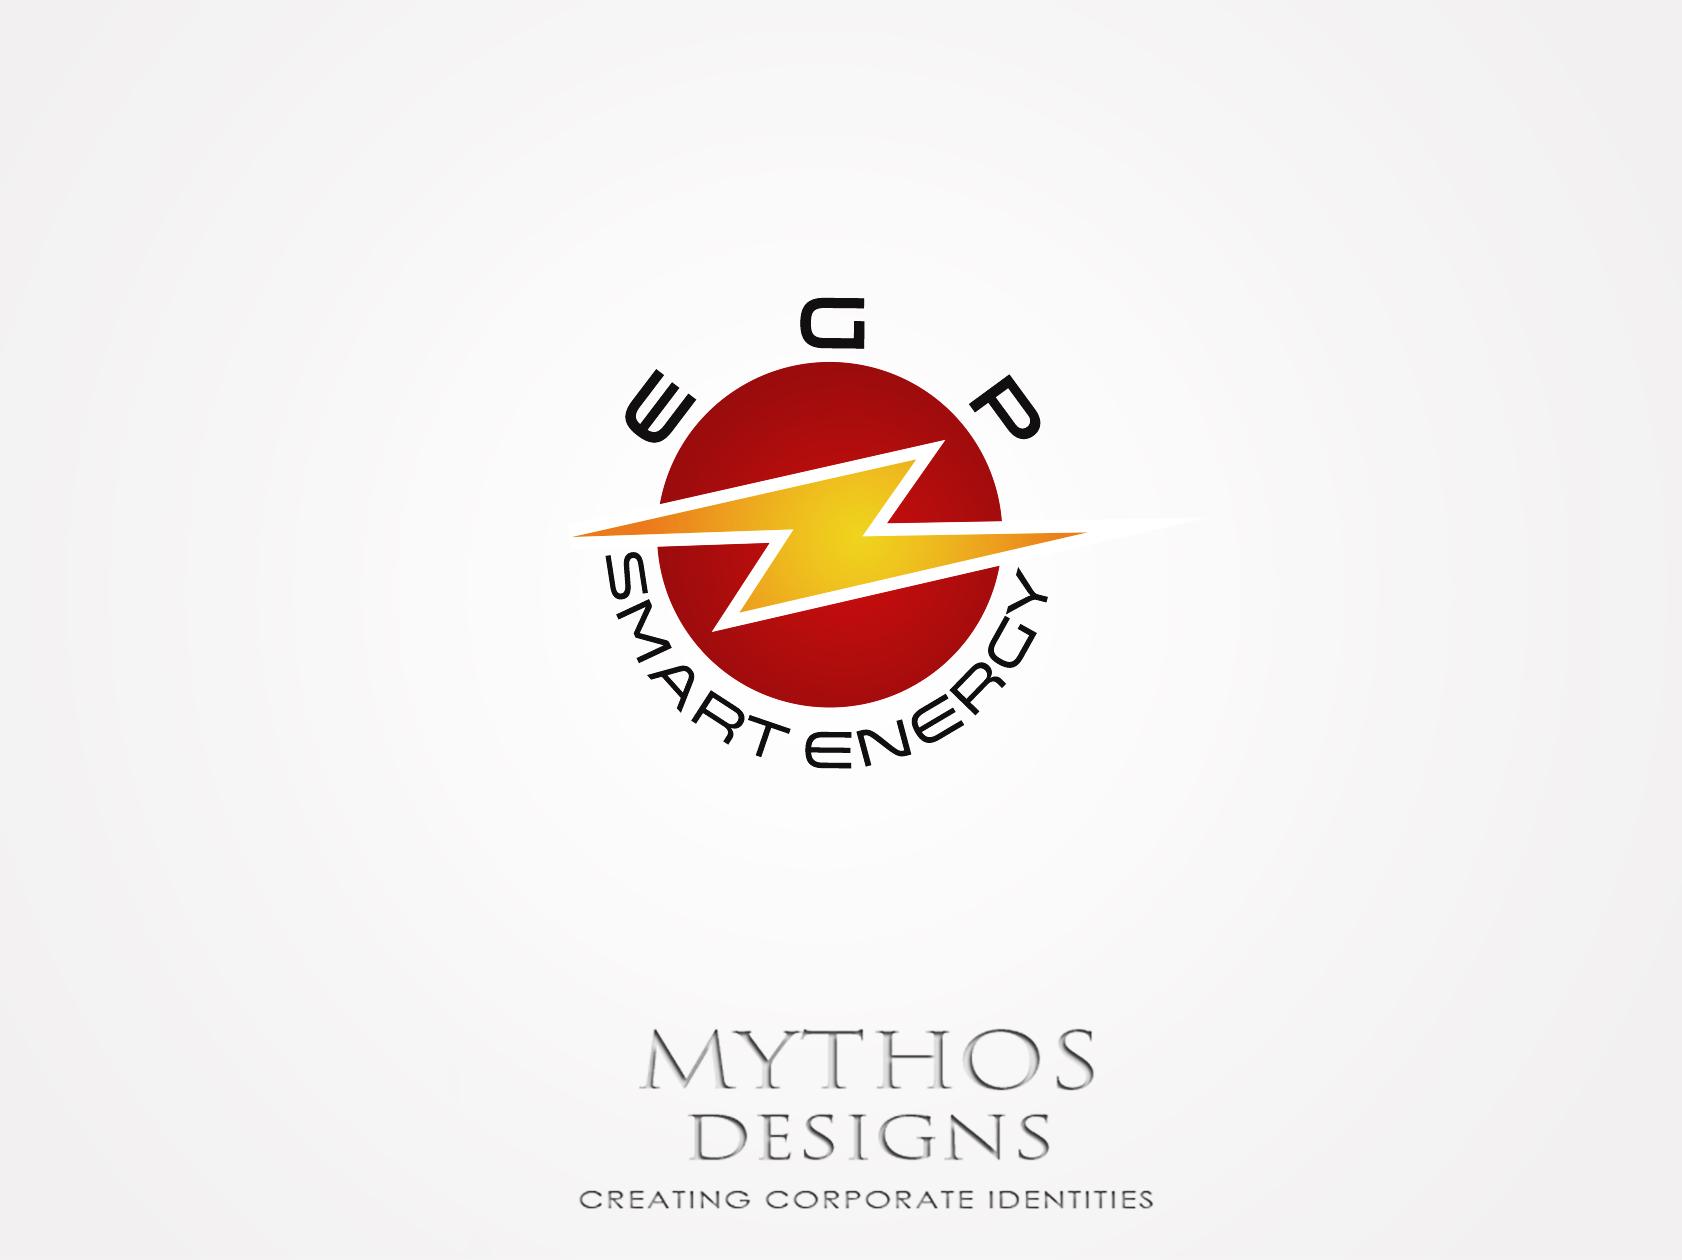 Logo Design by Mythos Designs - Entry No. 28 in the Logo Design Contest Captivating Logo Design for EGP Smart Energy.